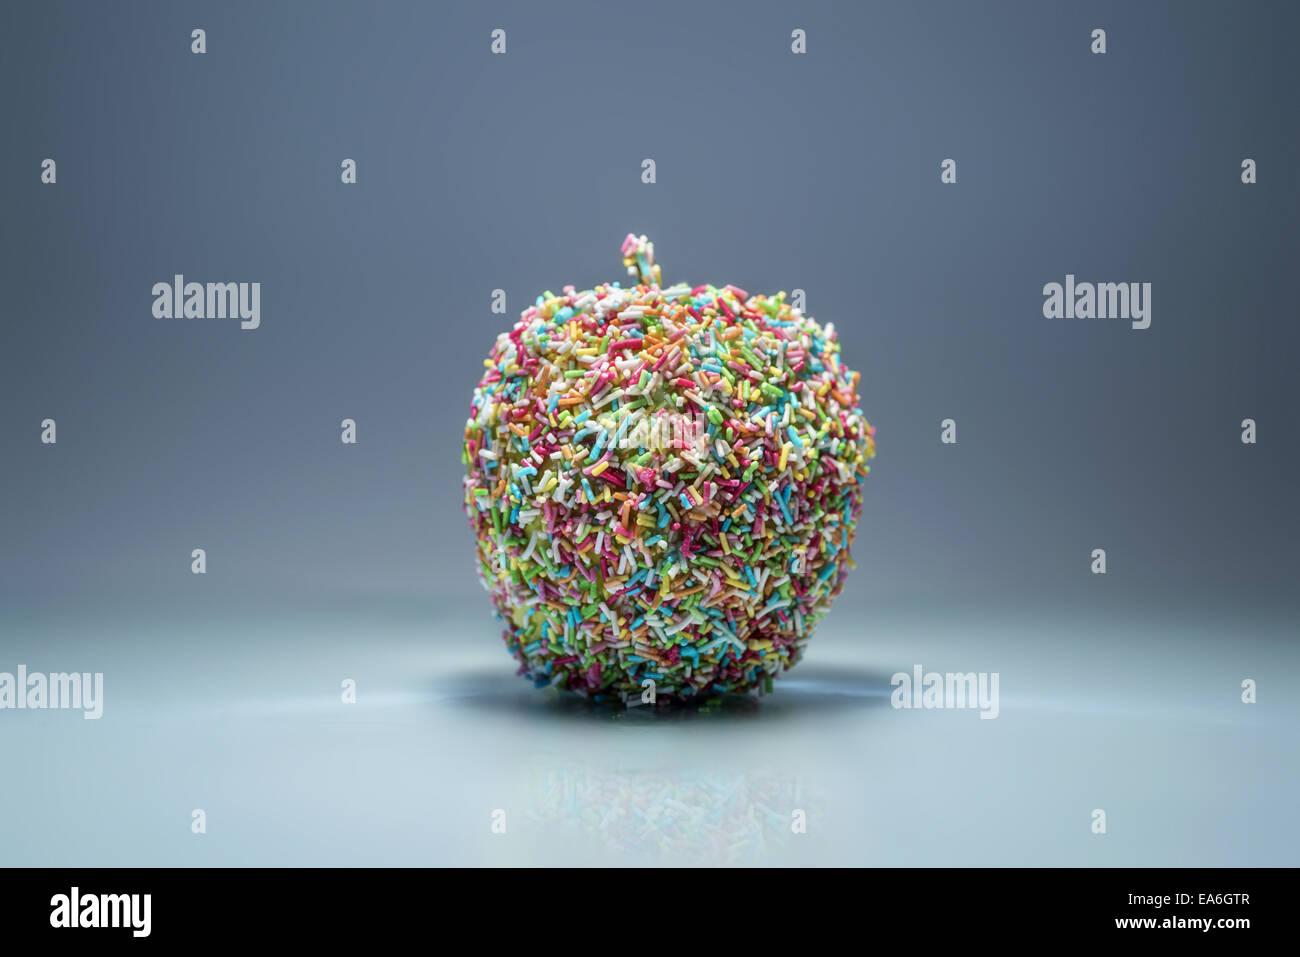 Apple mit bunten Streuseln bedeckt Stockbild